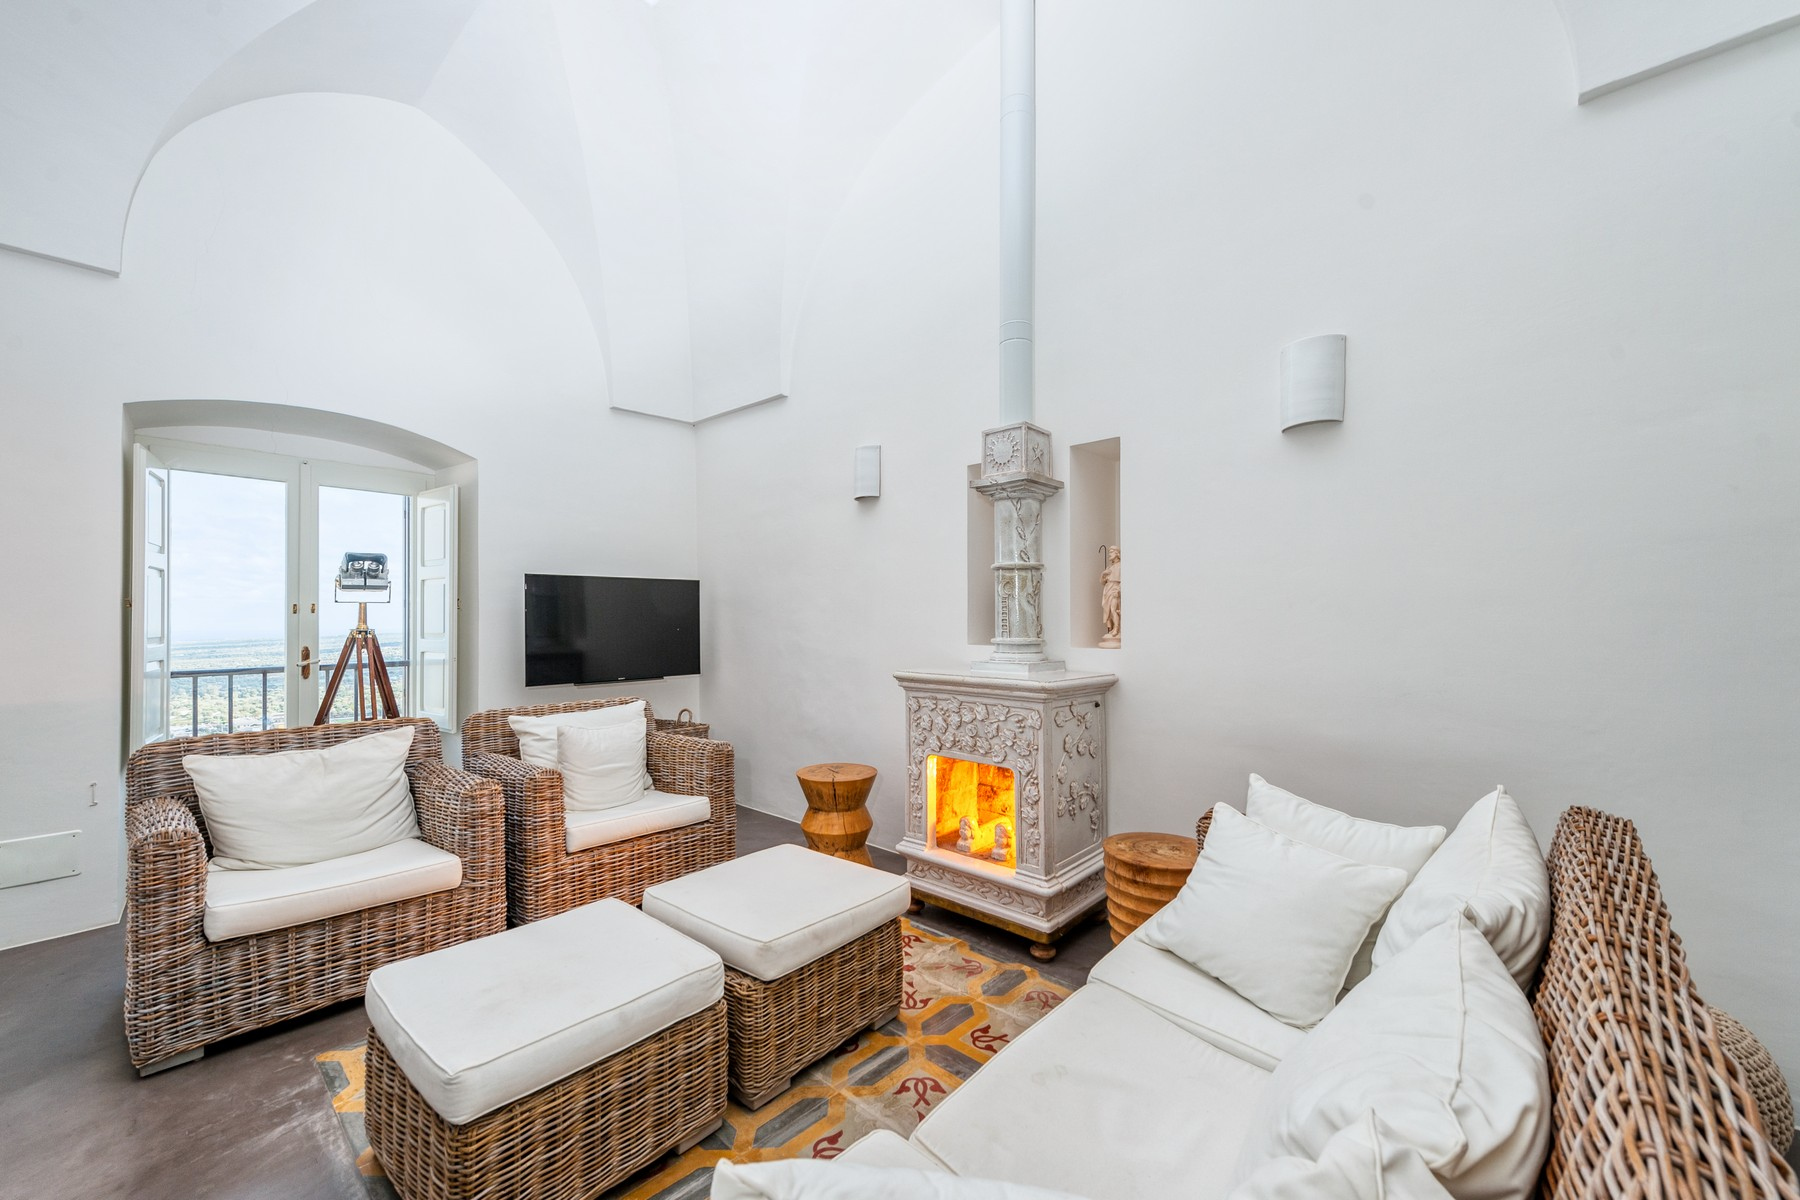 Appartamento in Vendita a Ostuni: 5 locali, 265 mq - Foto 3